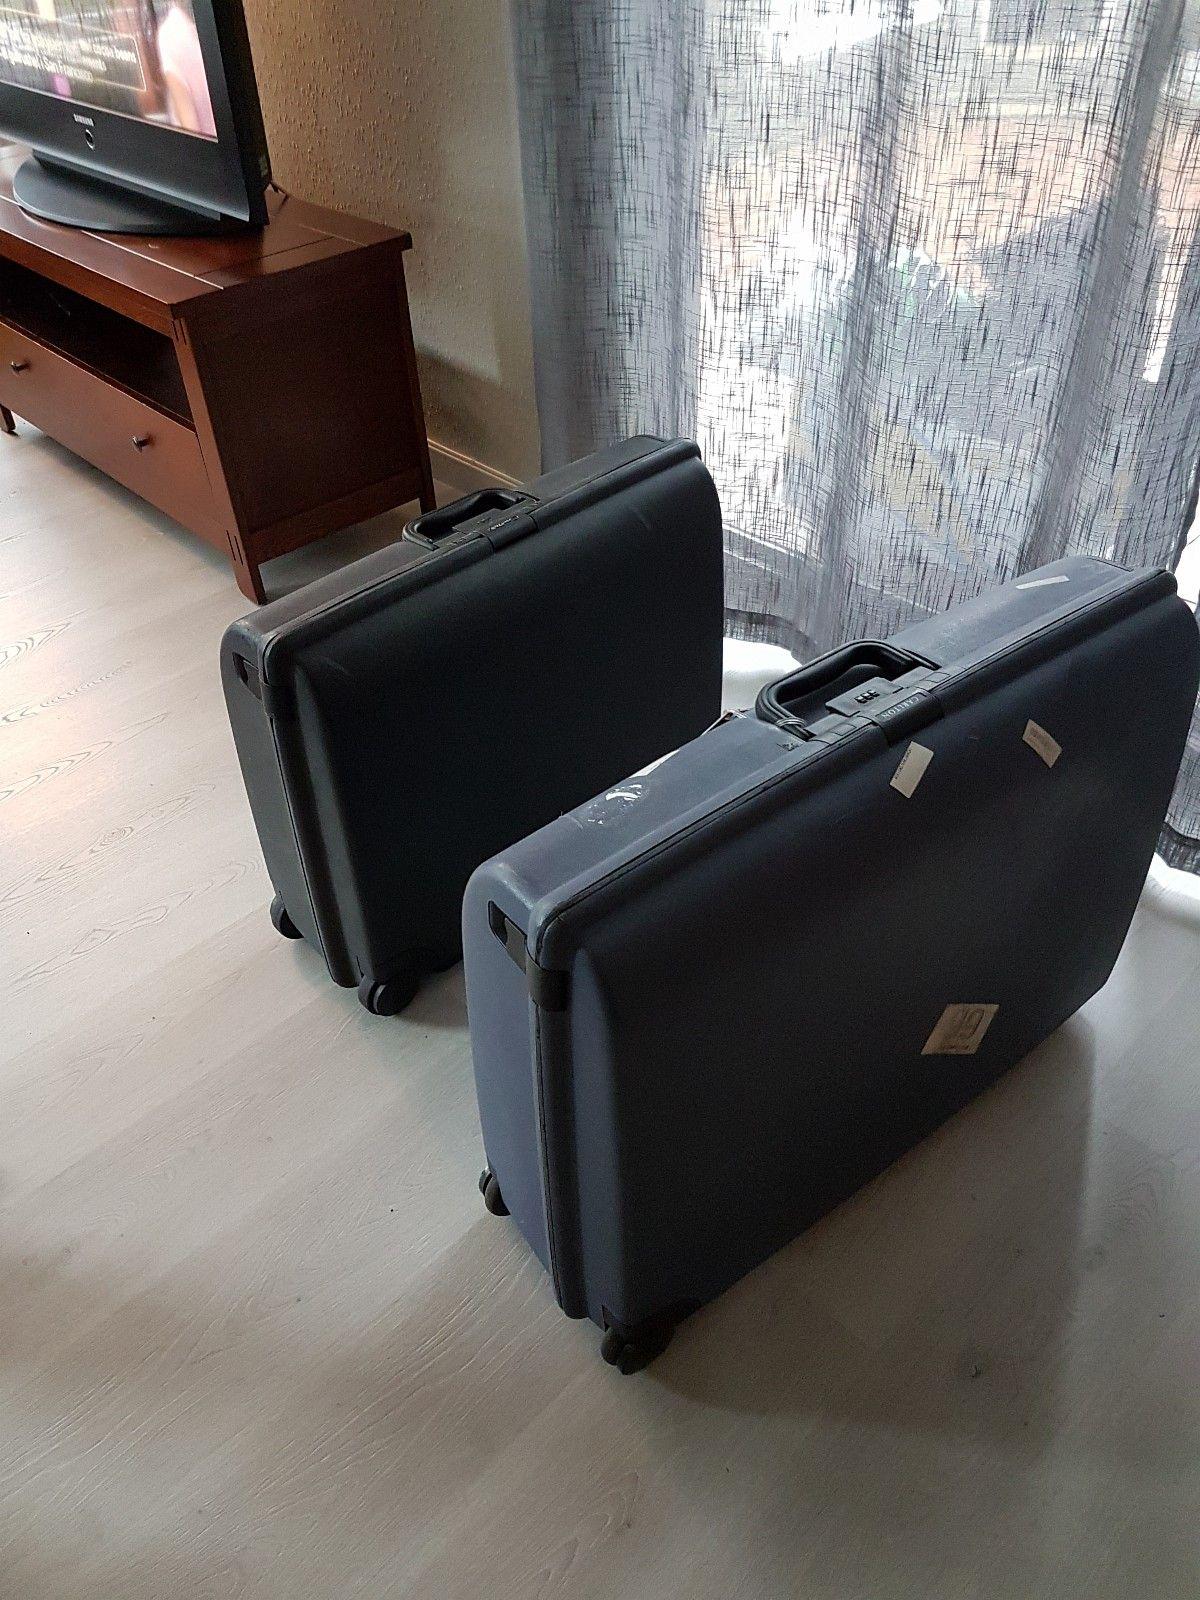 Carlton kofferter - Raufoss  - 2 stk carlton kofferter, 100 kr pr stk. - Raufoss